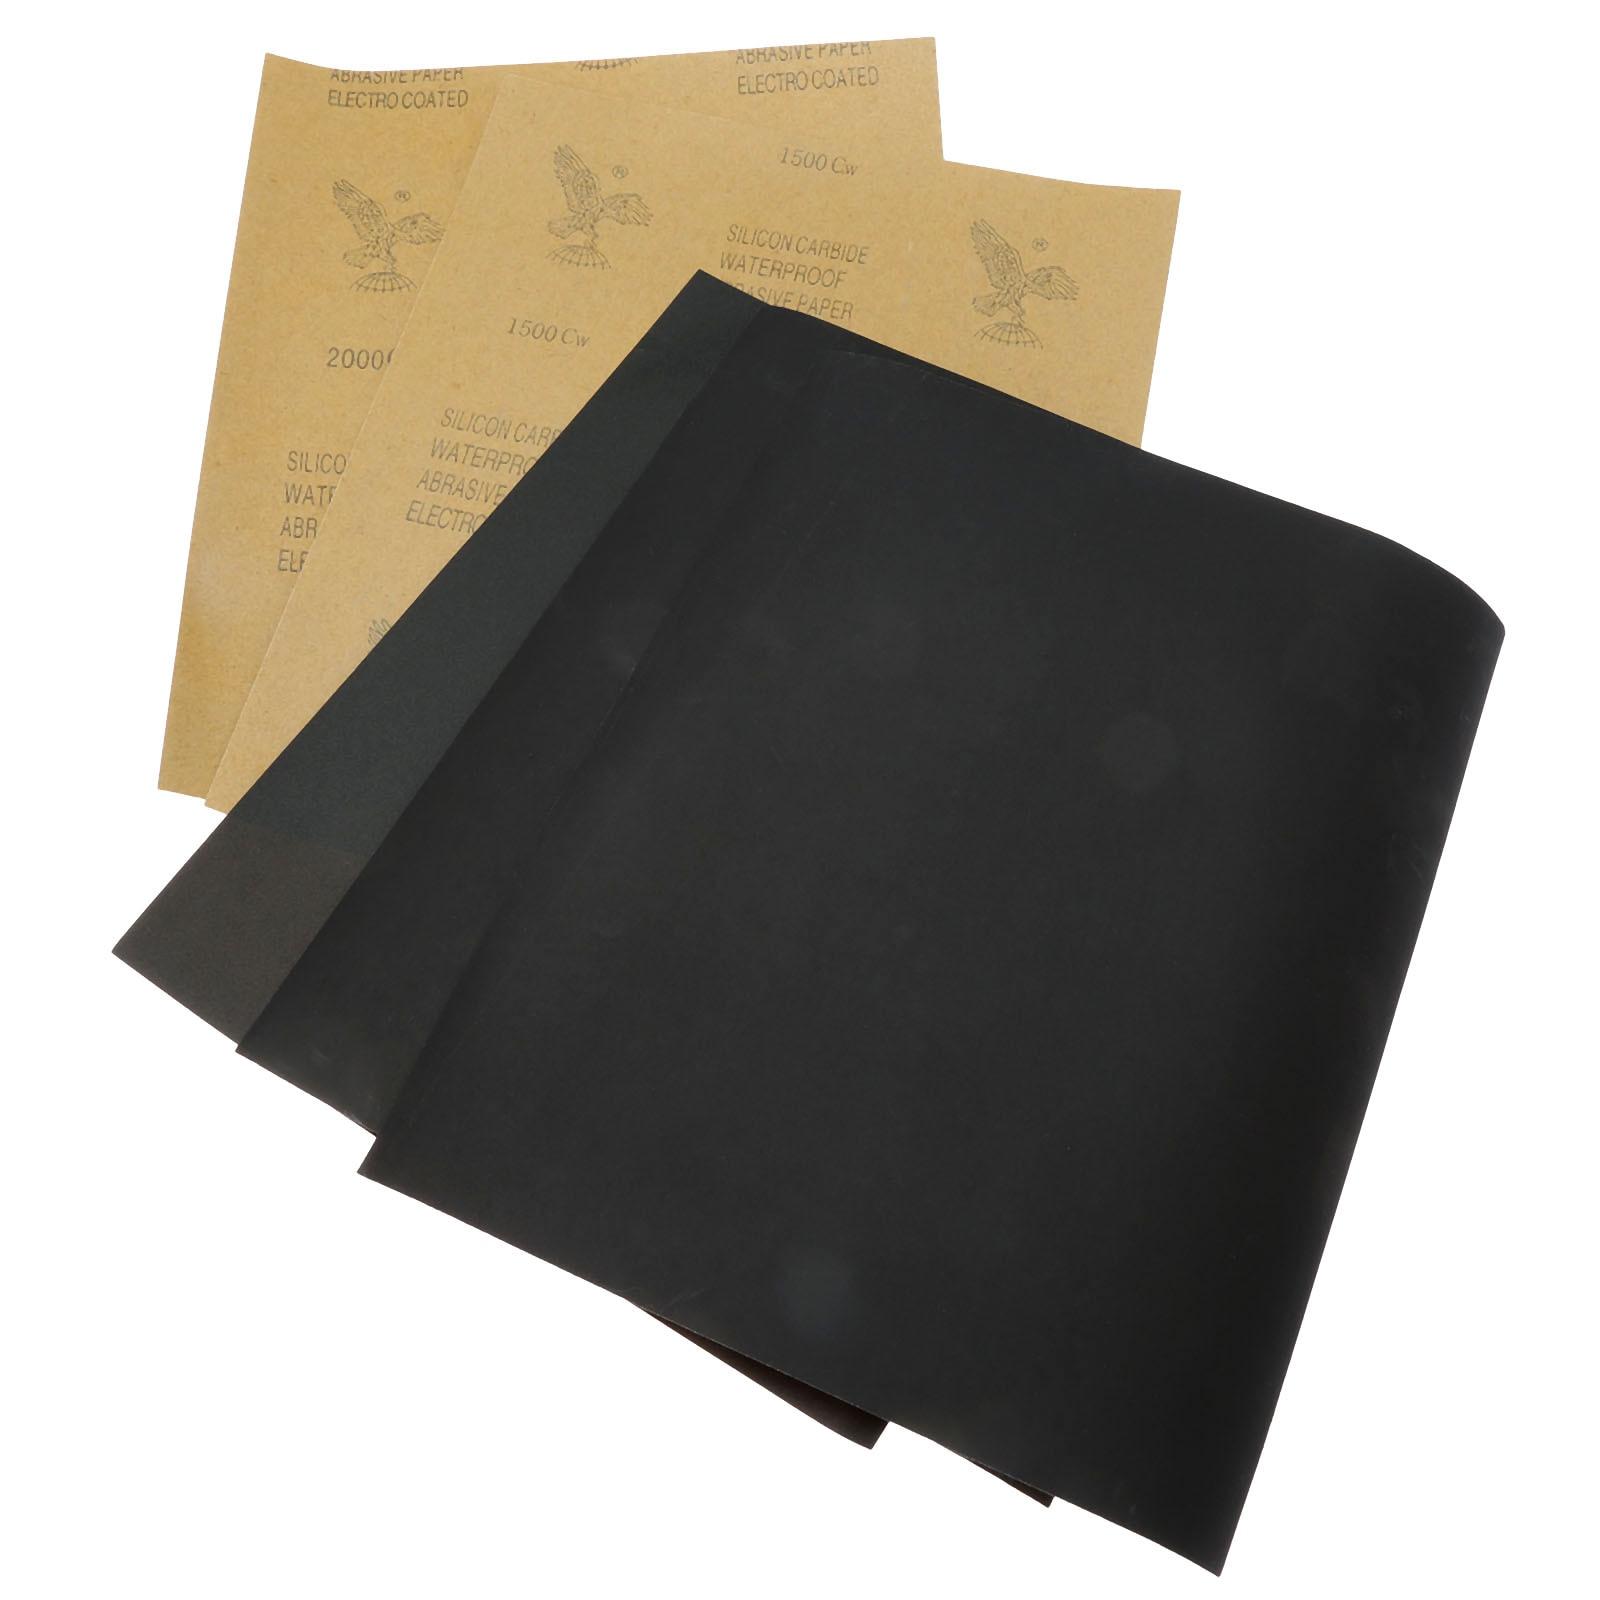 DRELD 5 fogli carta abrasiva impermeabile carta abrasiva carta - Utensili abrasivi - Fotografia 5